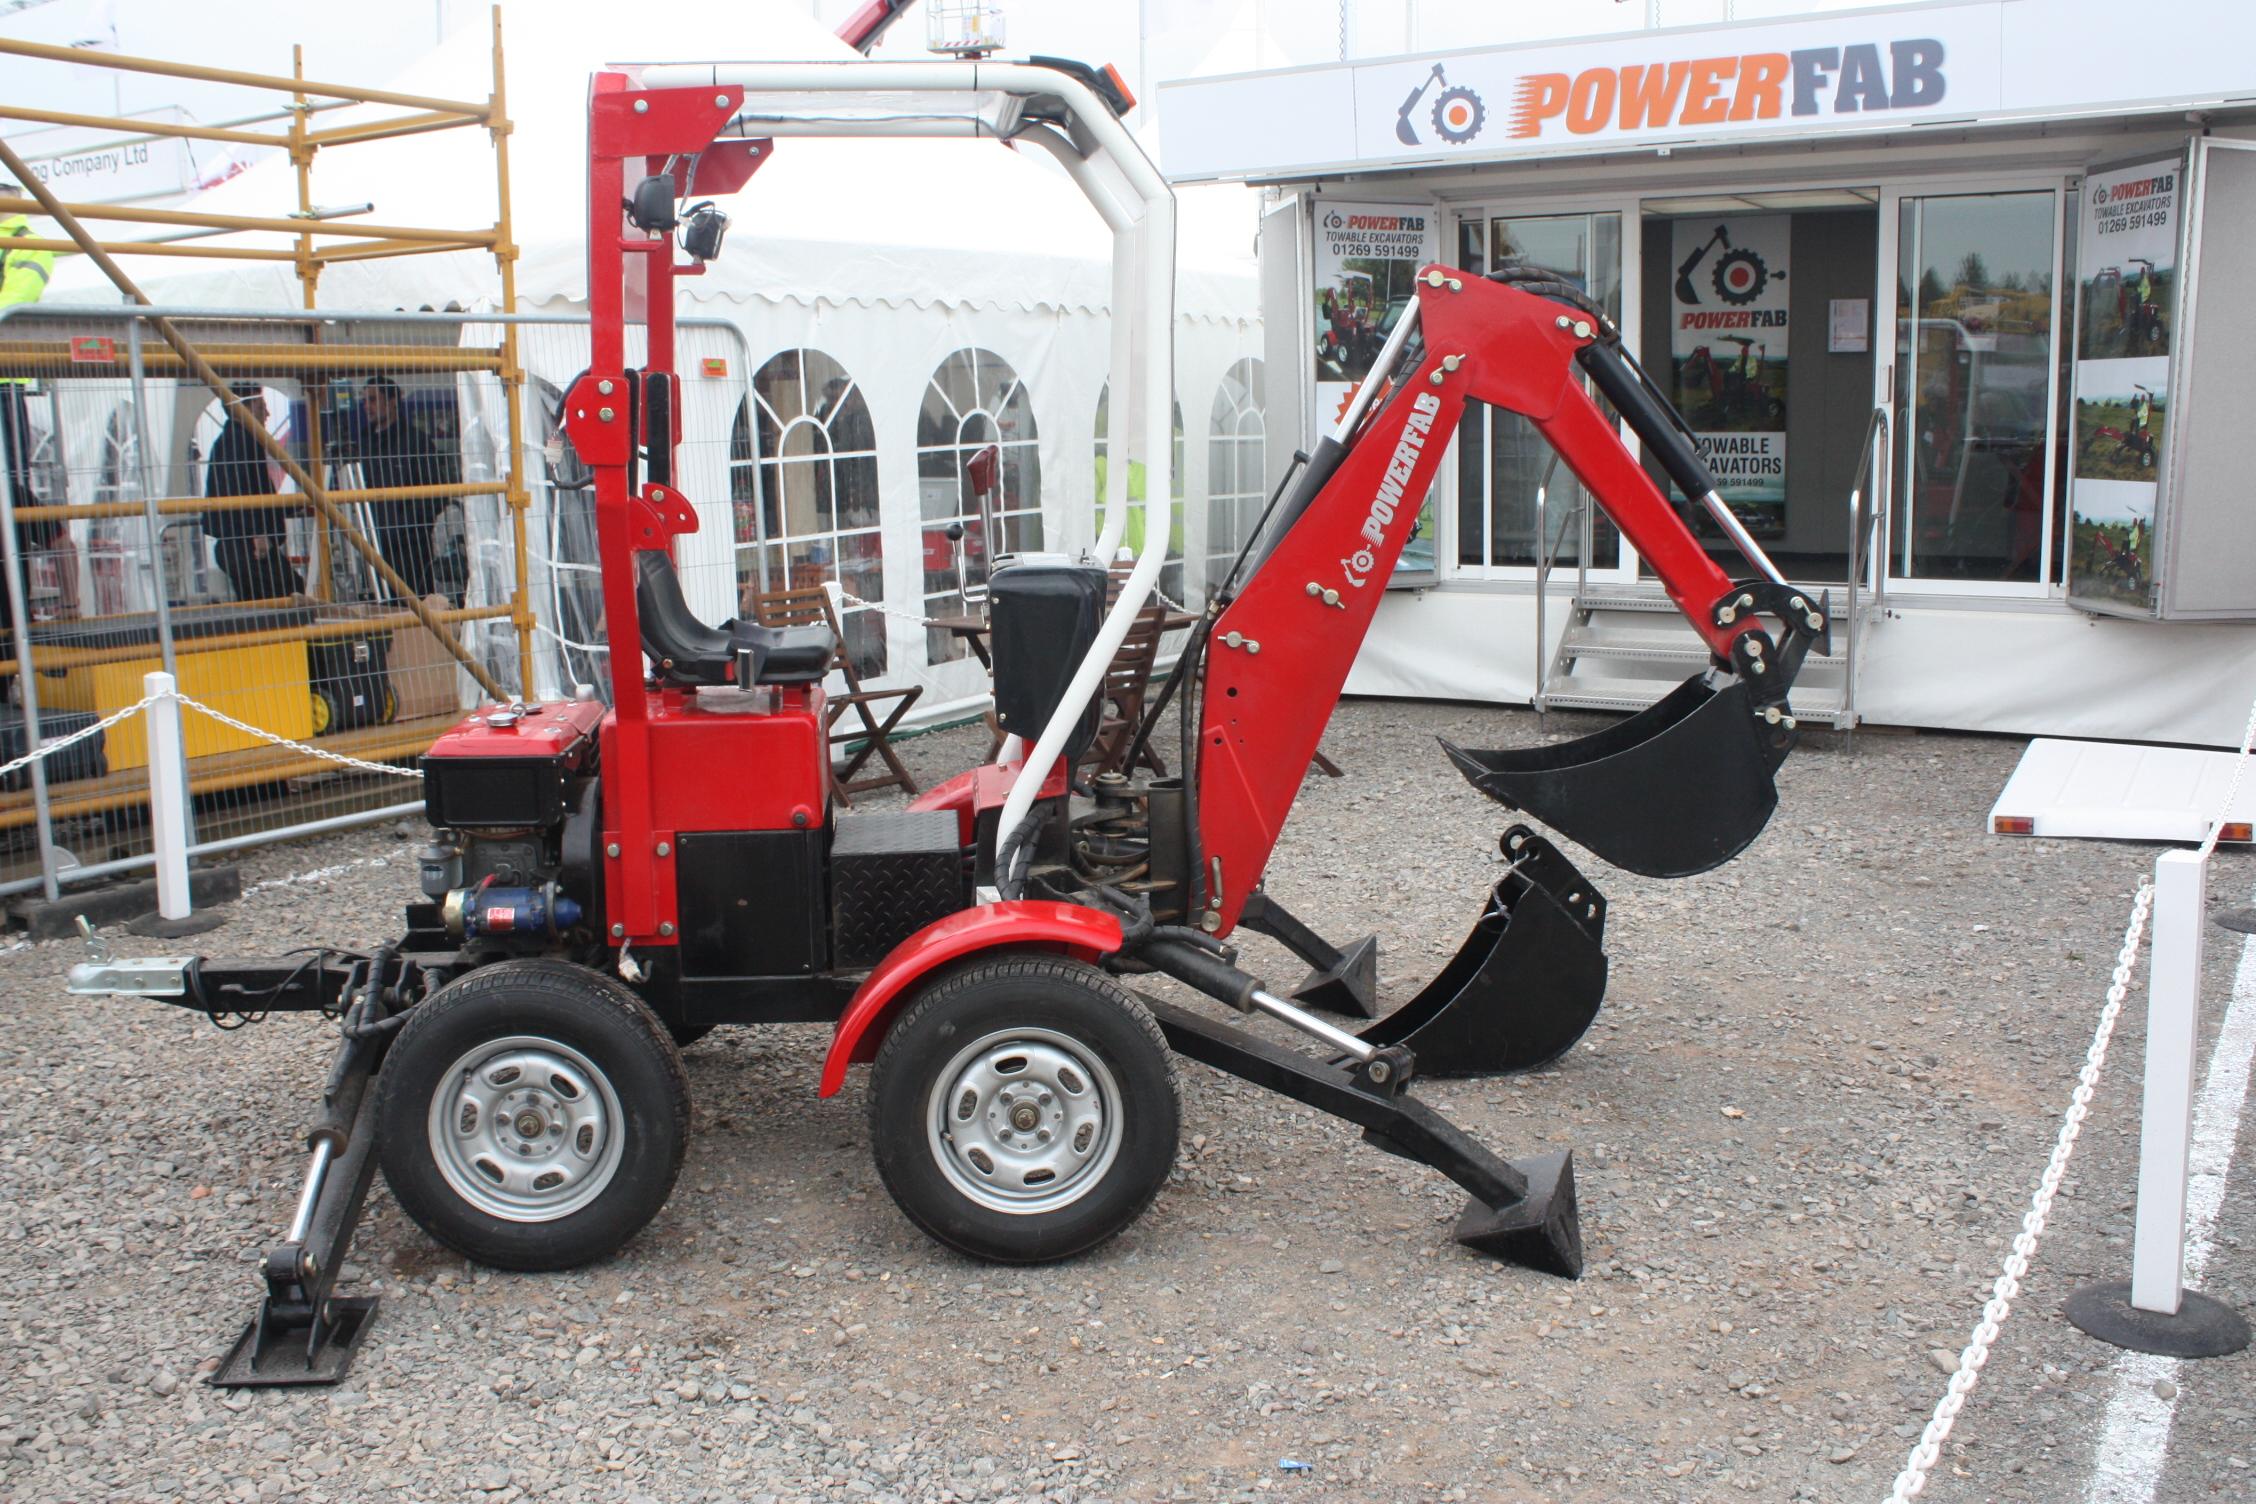 towed excavators tractor construction plant wiki fandom new powerfab excavator sed 09 8359